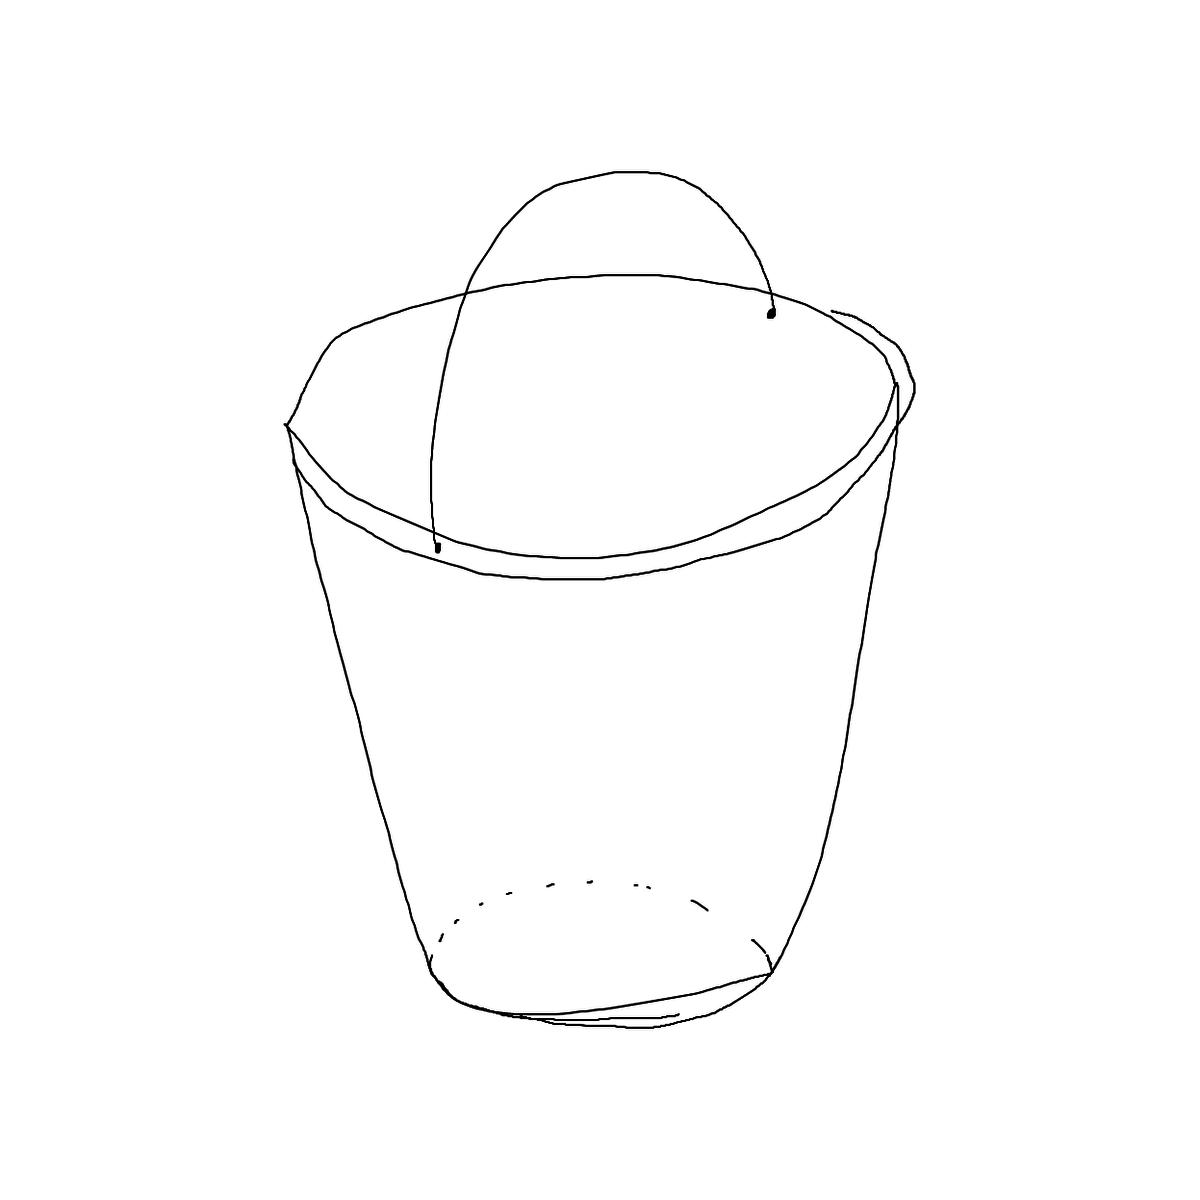 BAAAM drawing#4156 lat:52.4749374389648440lng: 13.4072198867797850